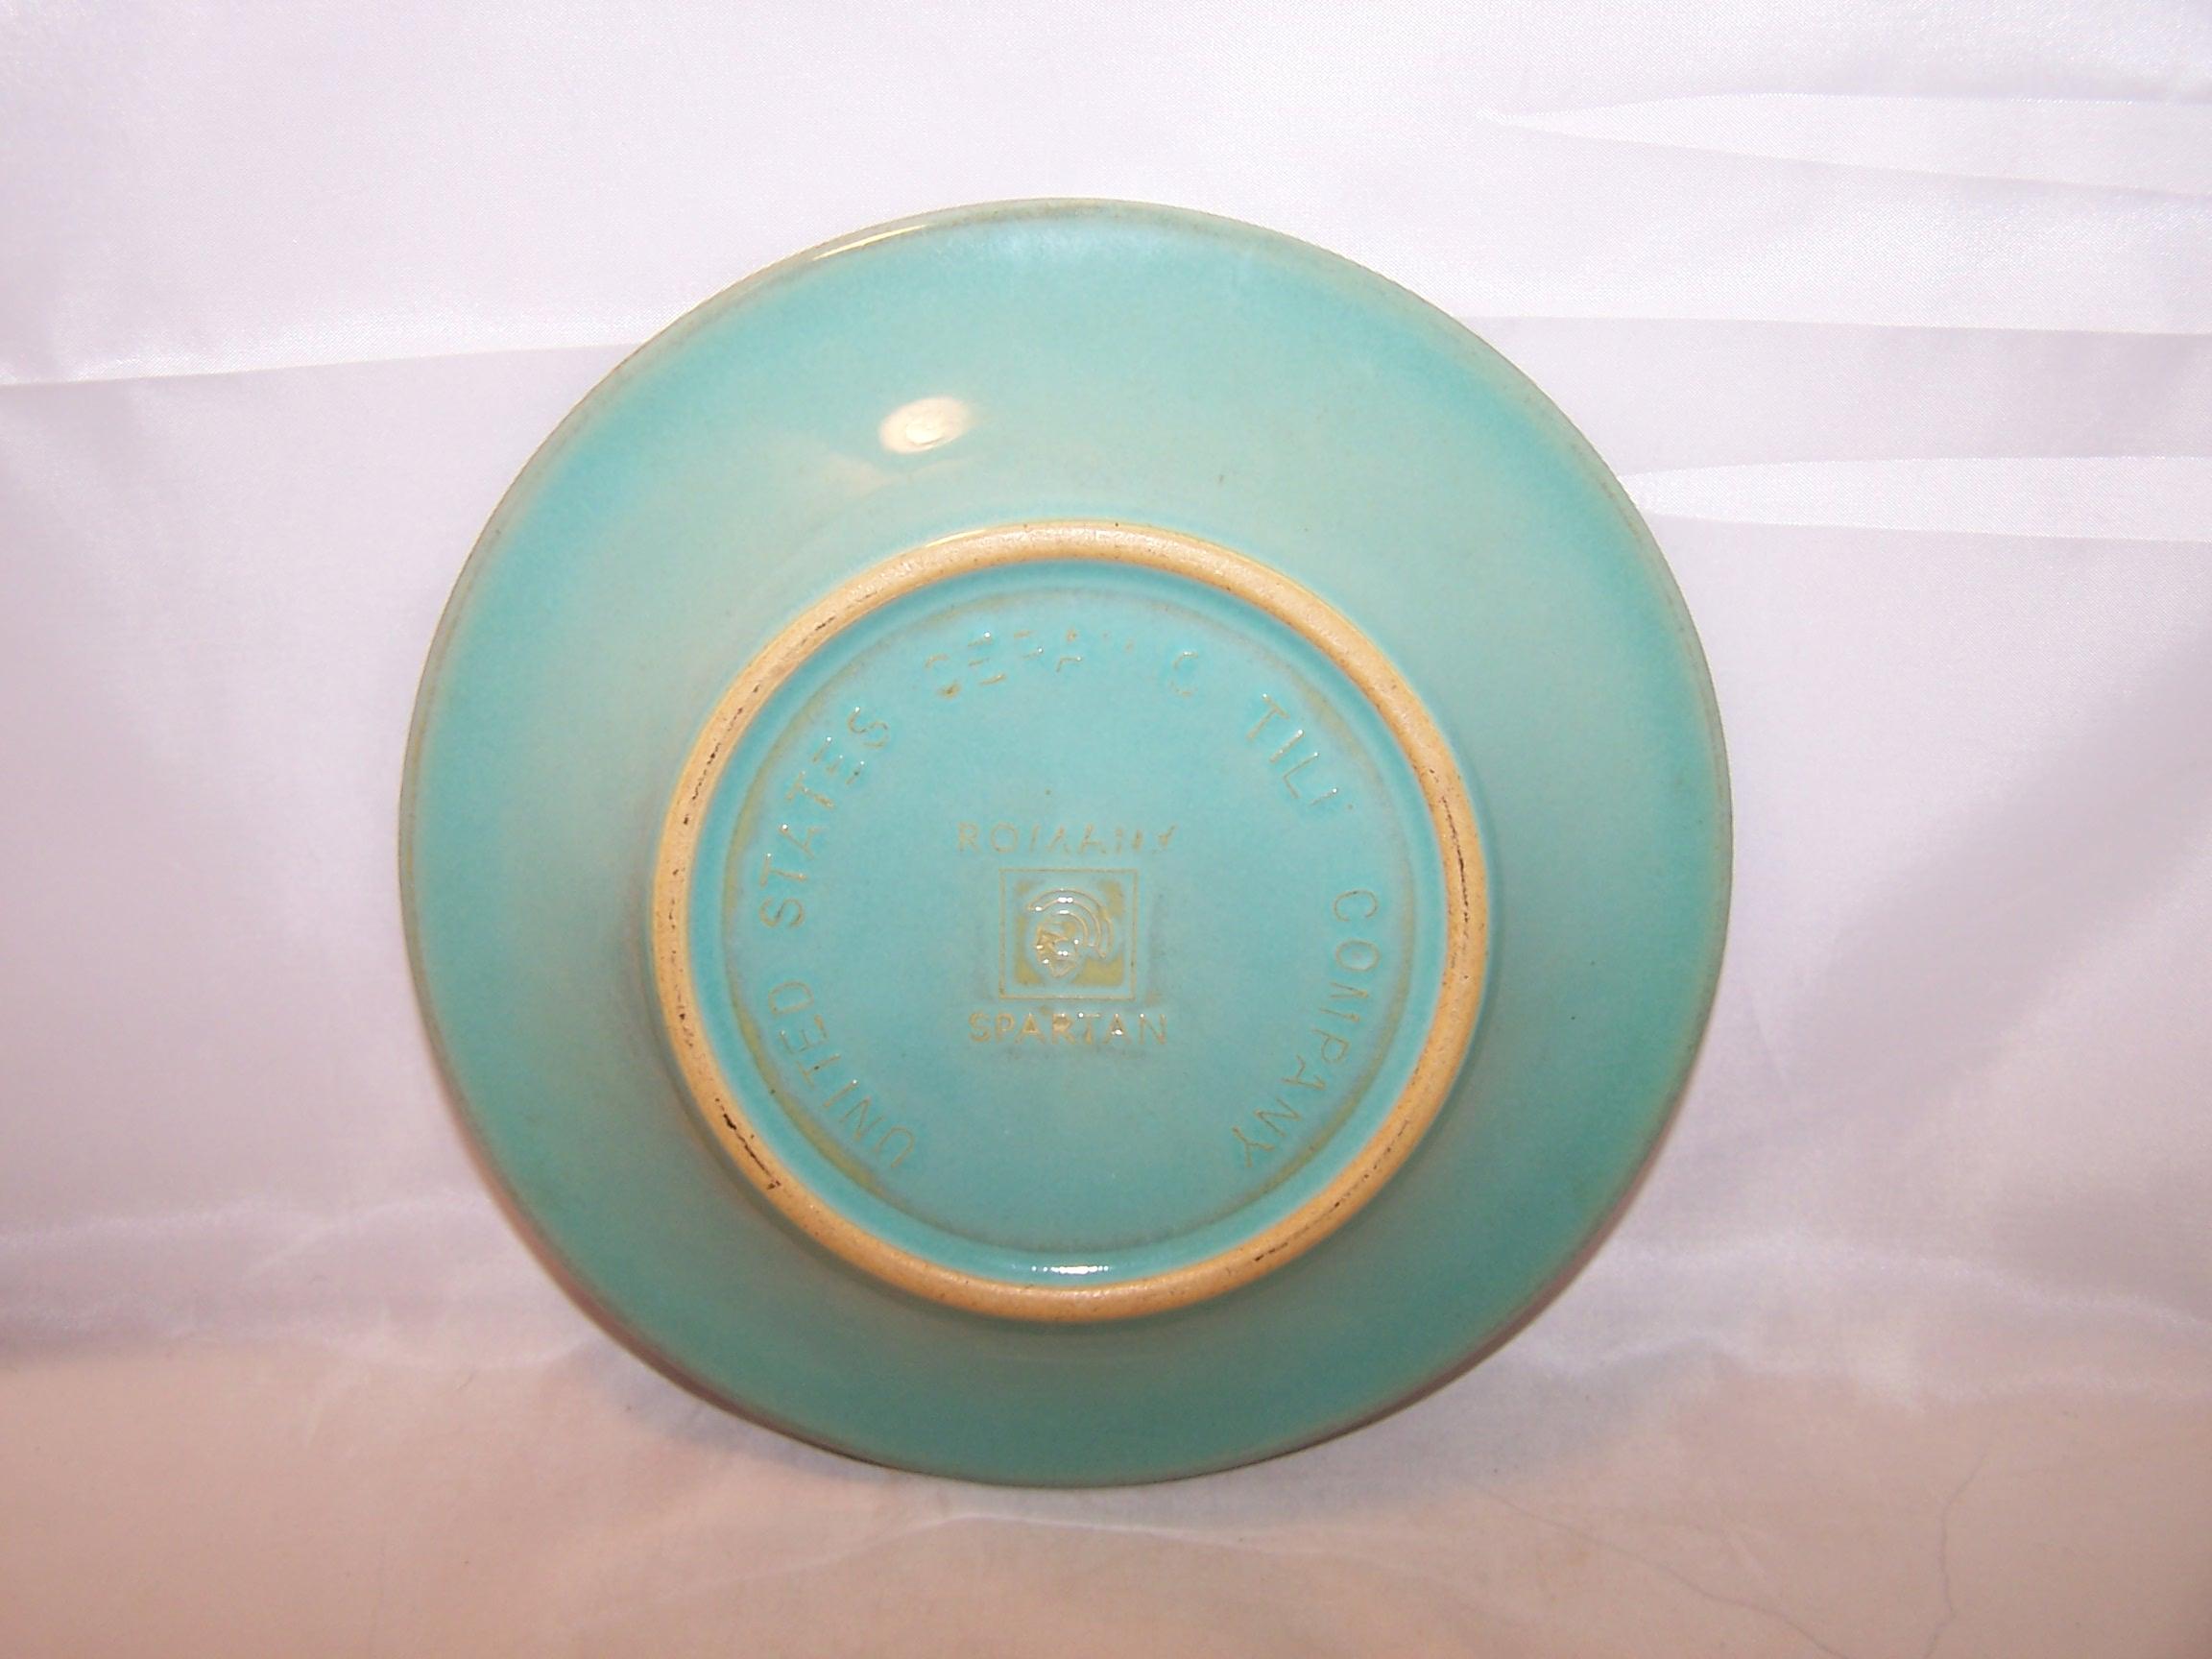 Image 4 of Romany Sparta, Salad Dessert Plate, Set of 4, US Ceramic Tile Company